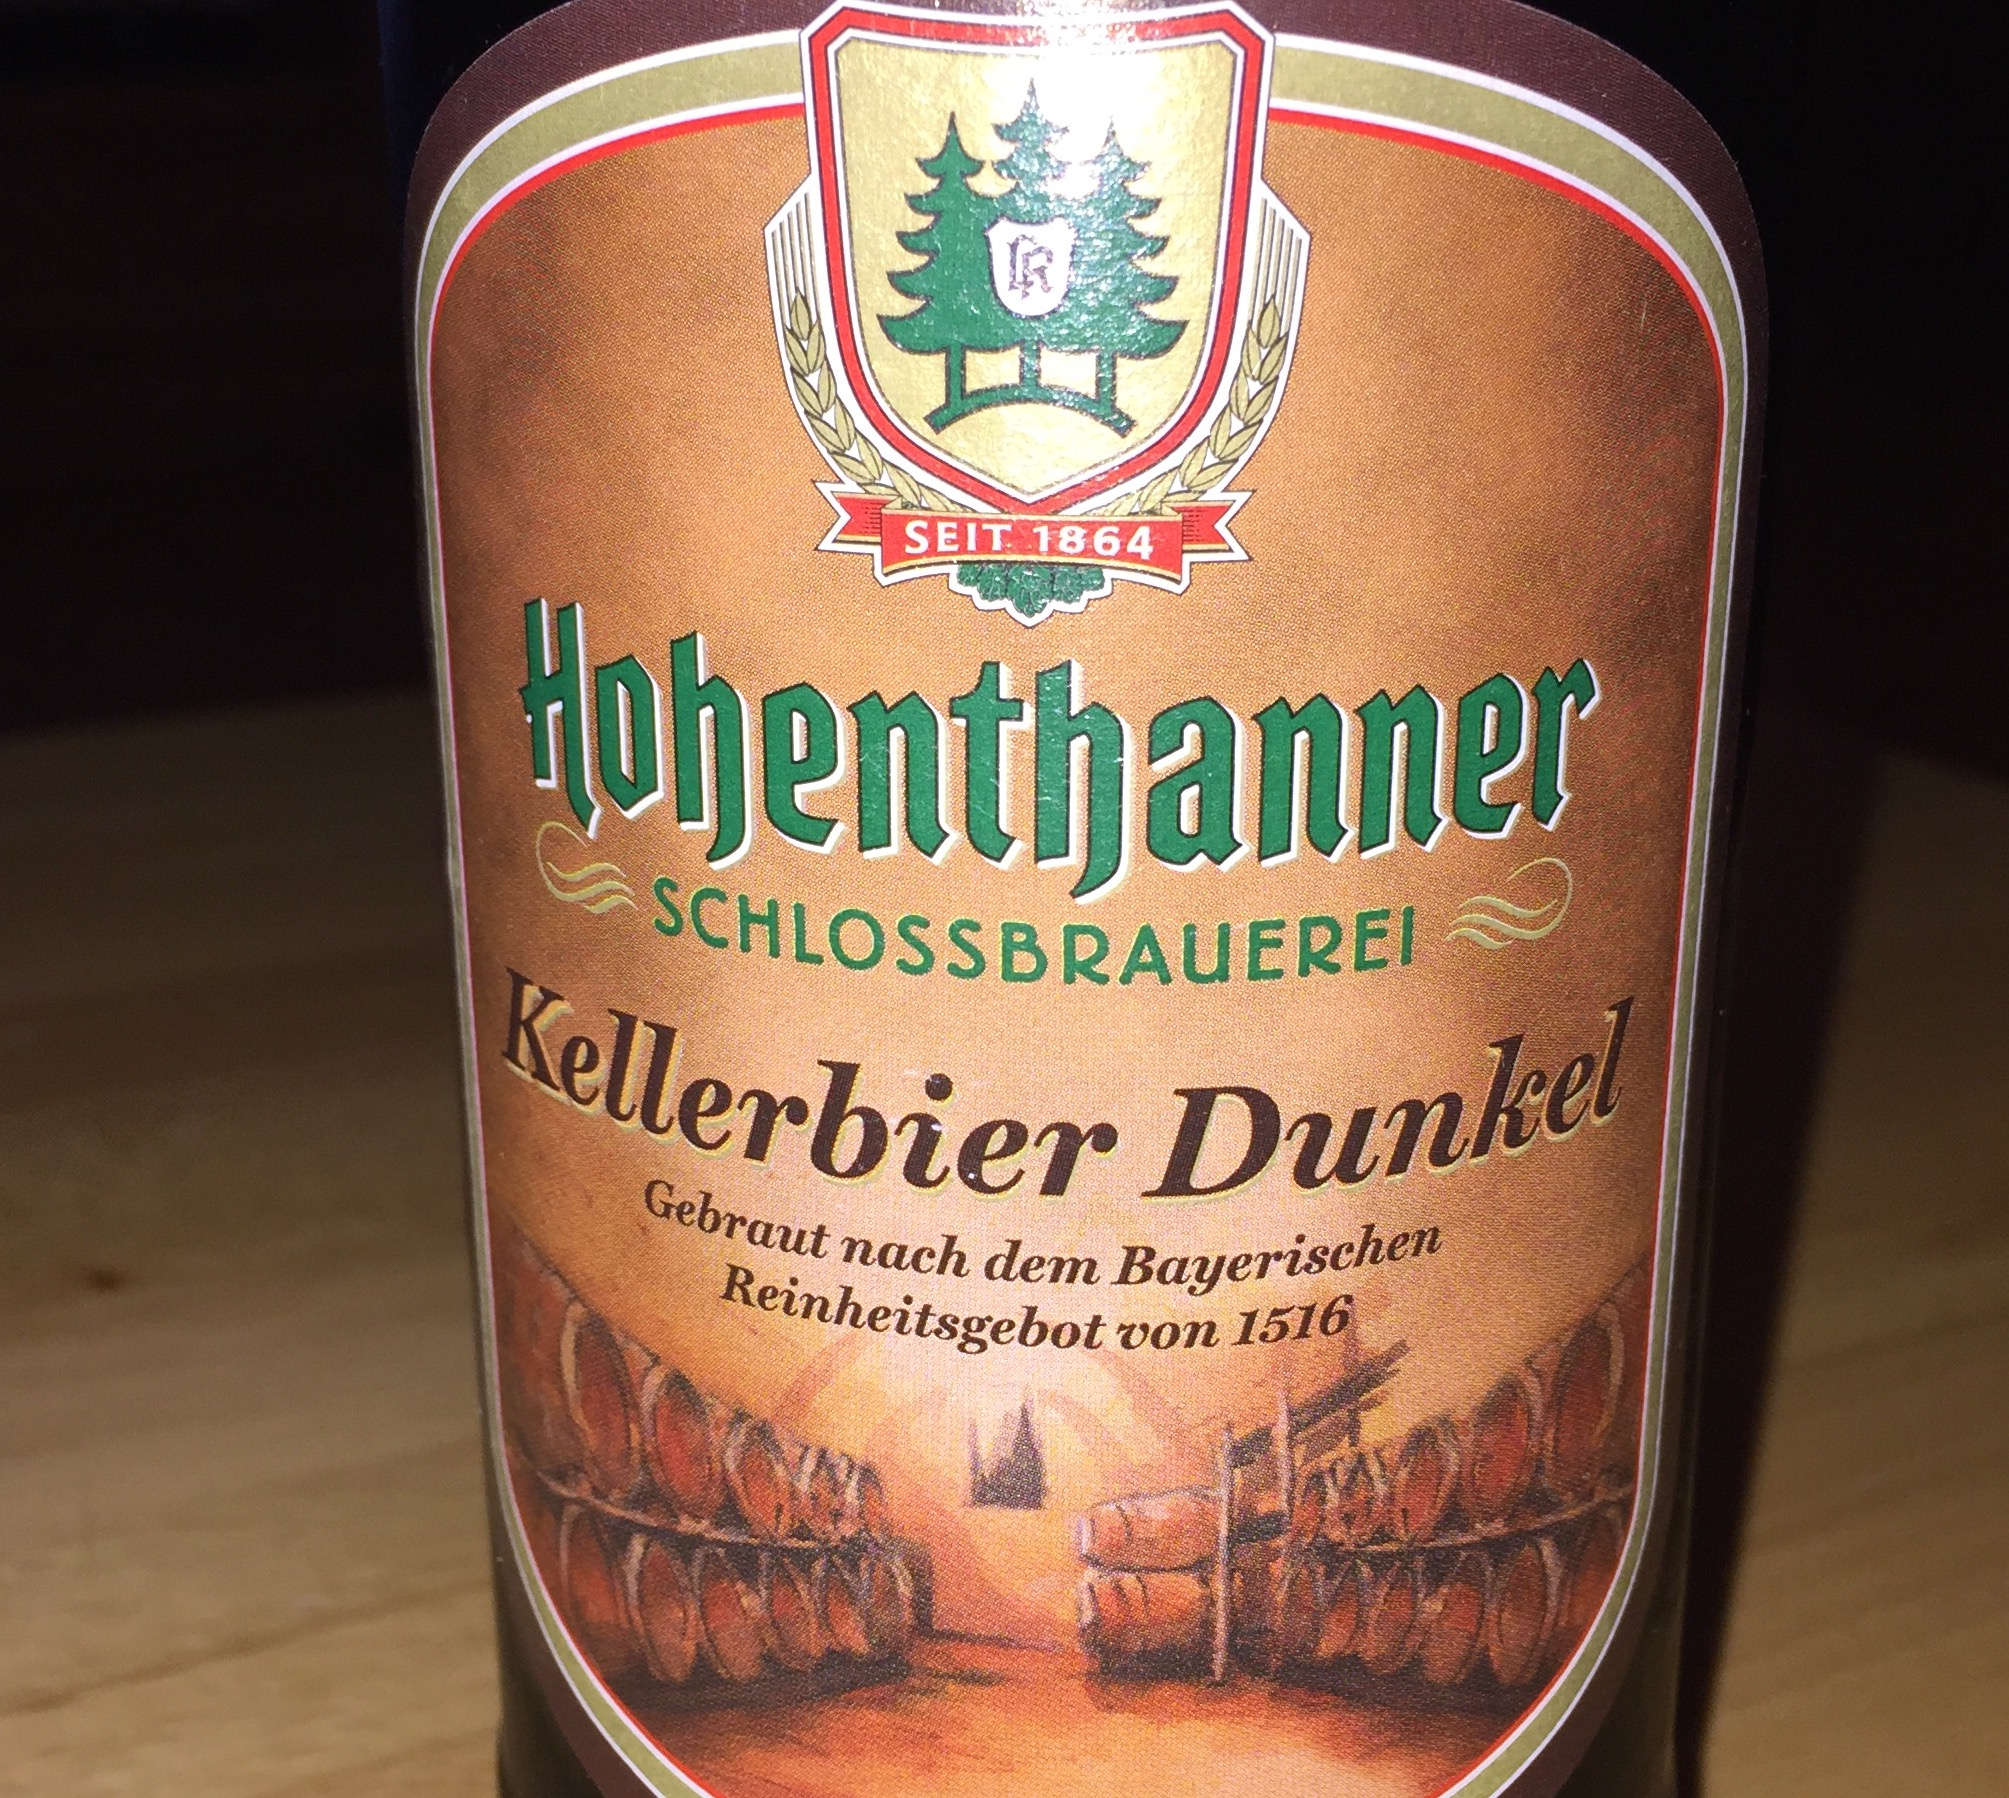 Hohenthanner - Kellerbier Dunkel